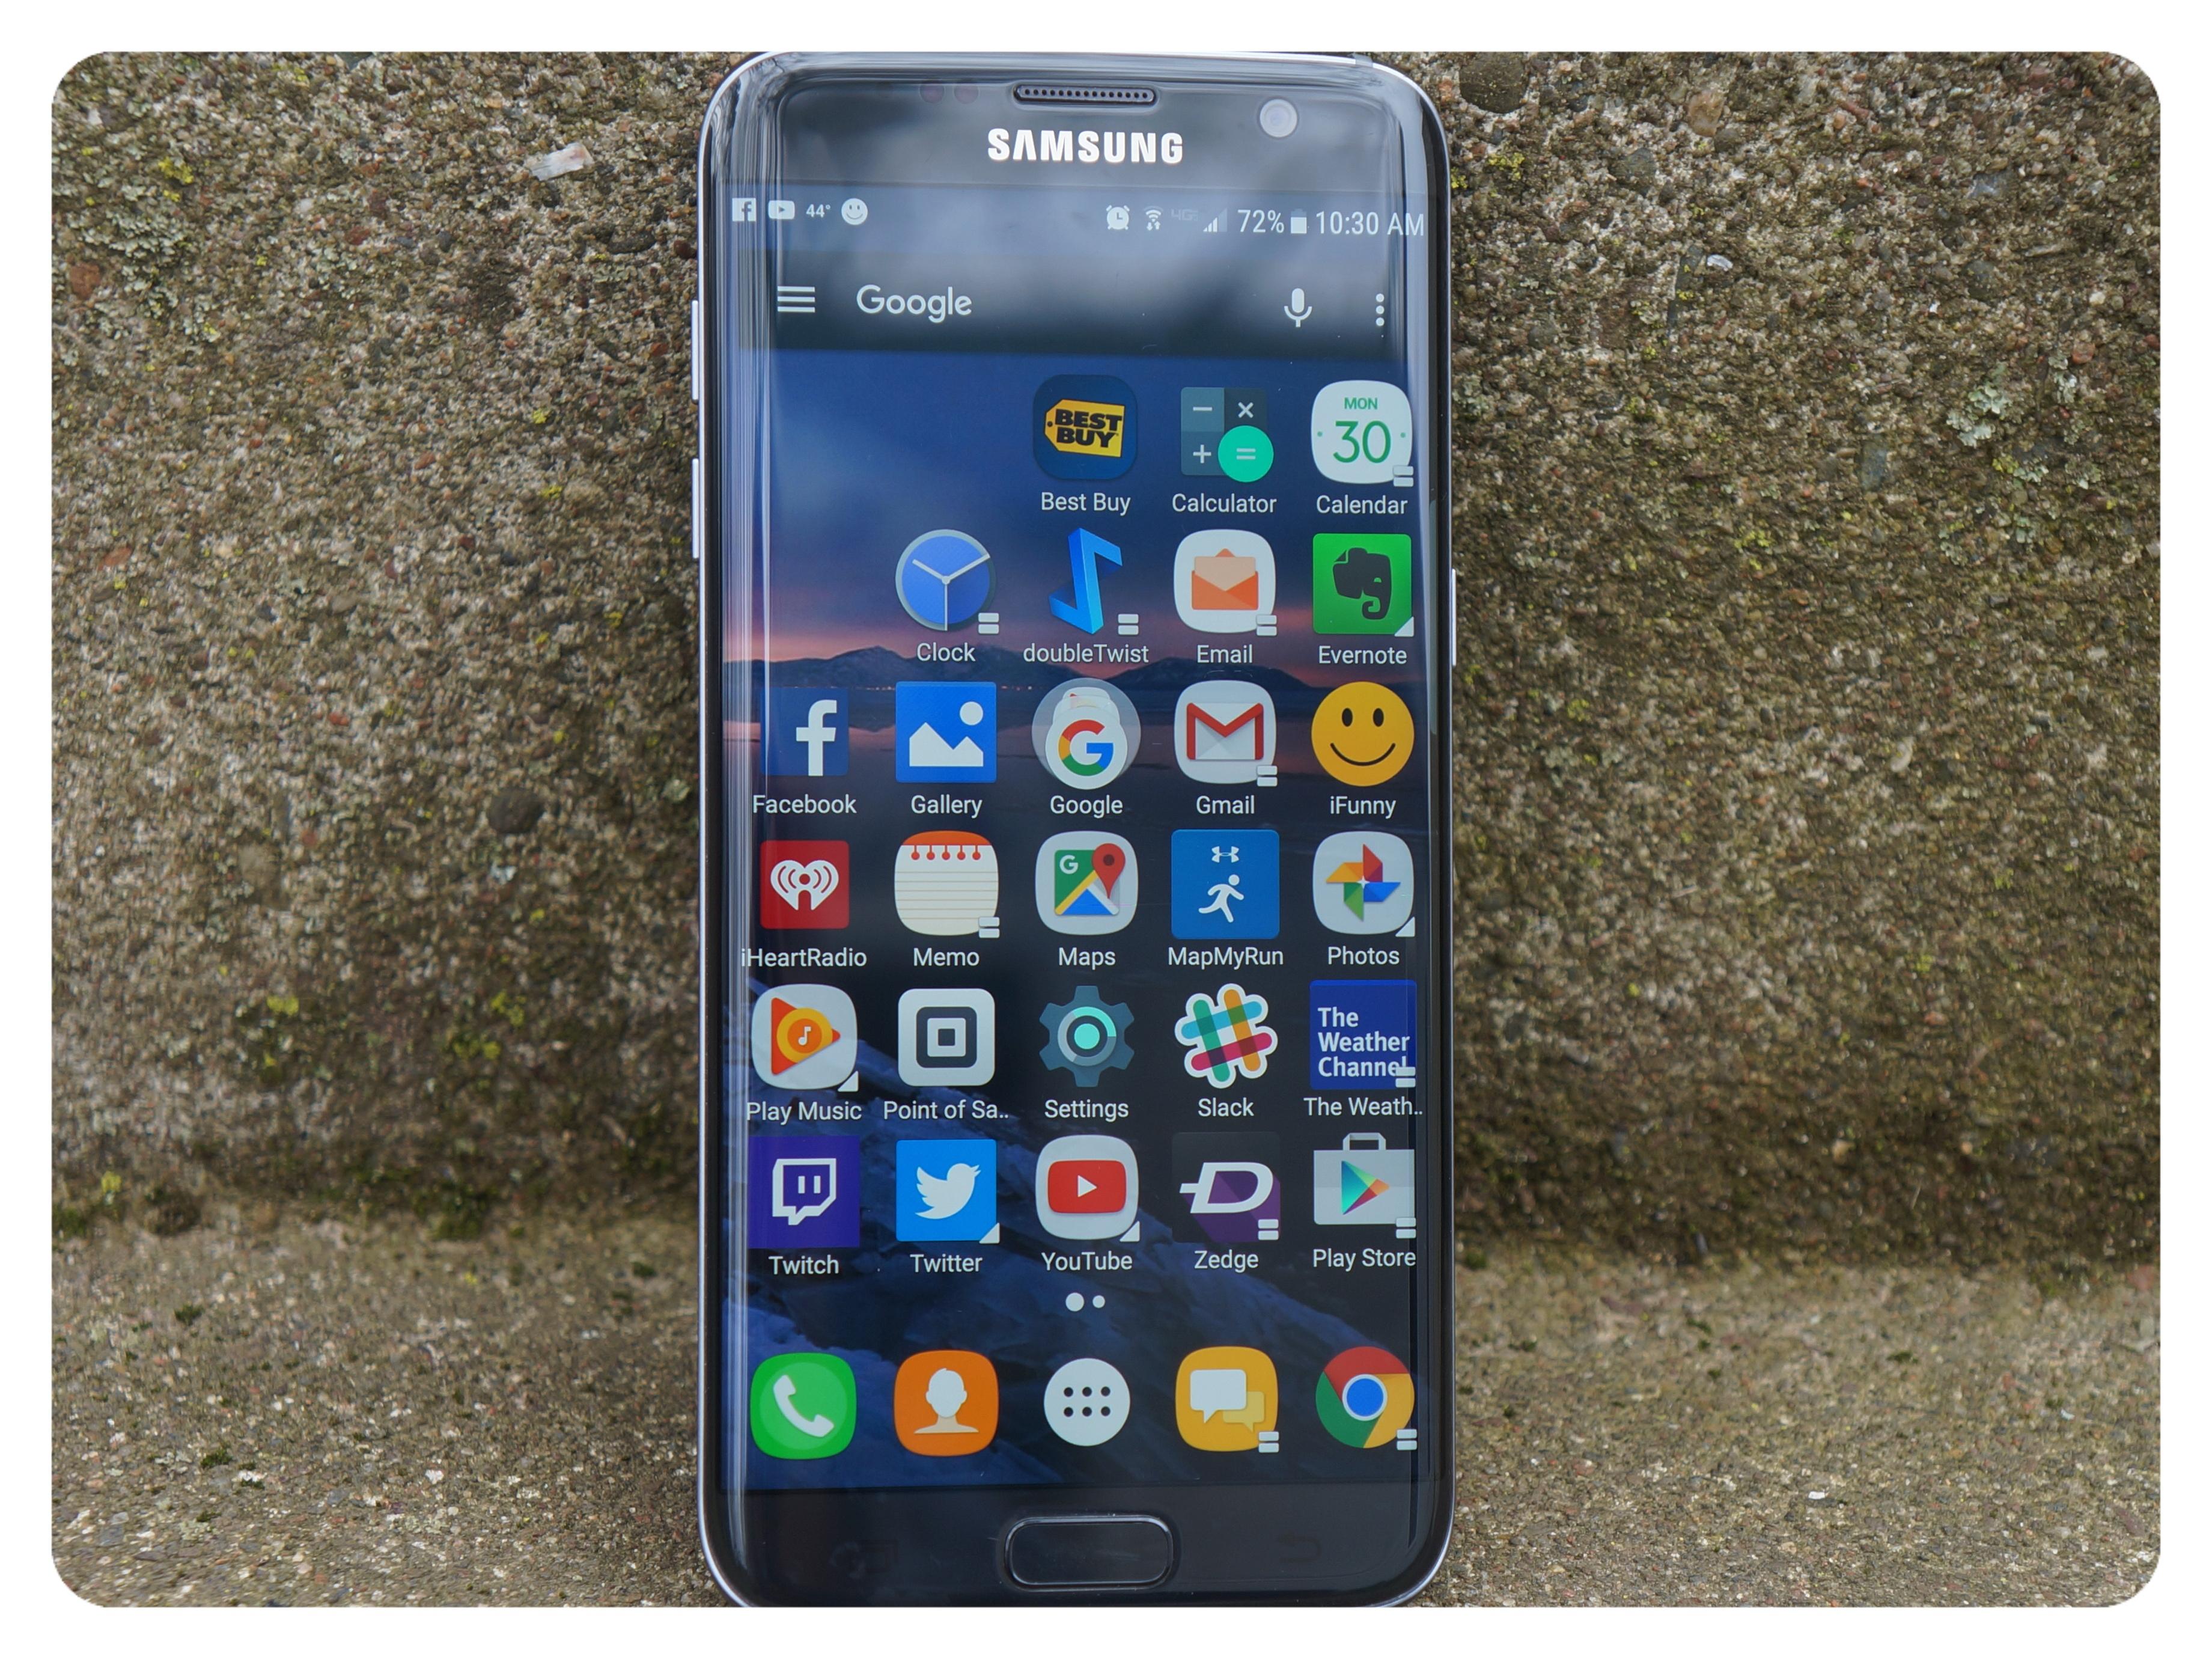 Samsung working on Galaxy phones codenamed 'Winner' and 'Beyond'